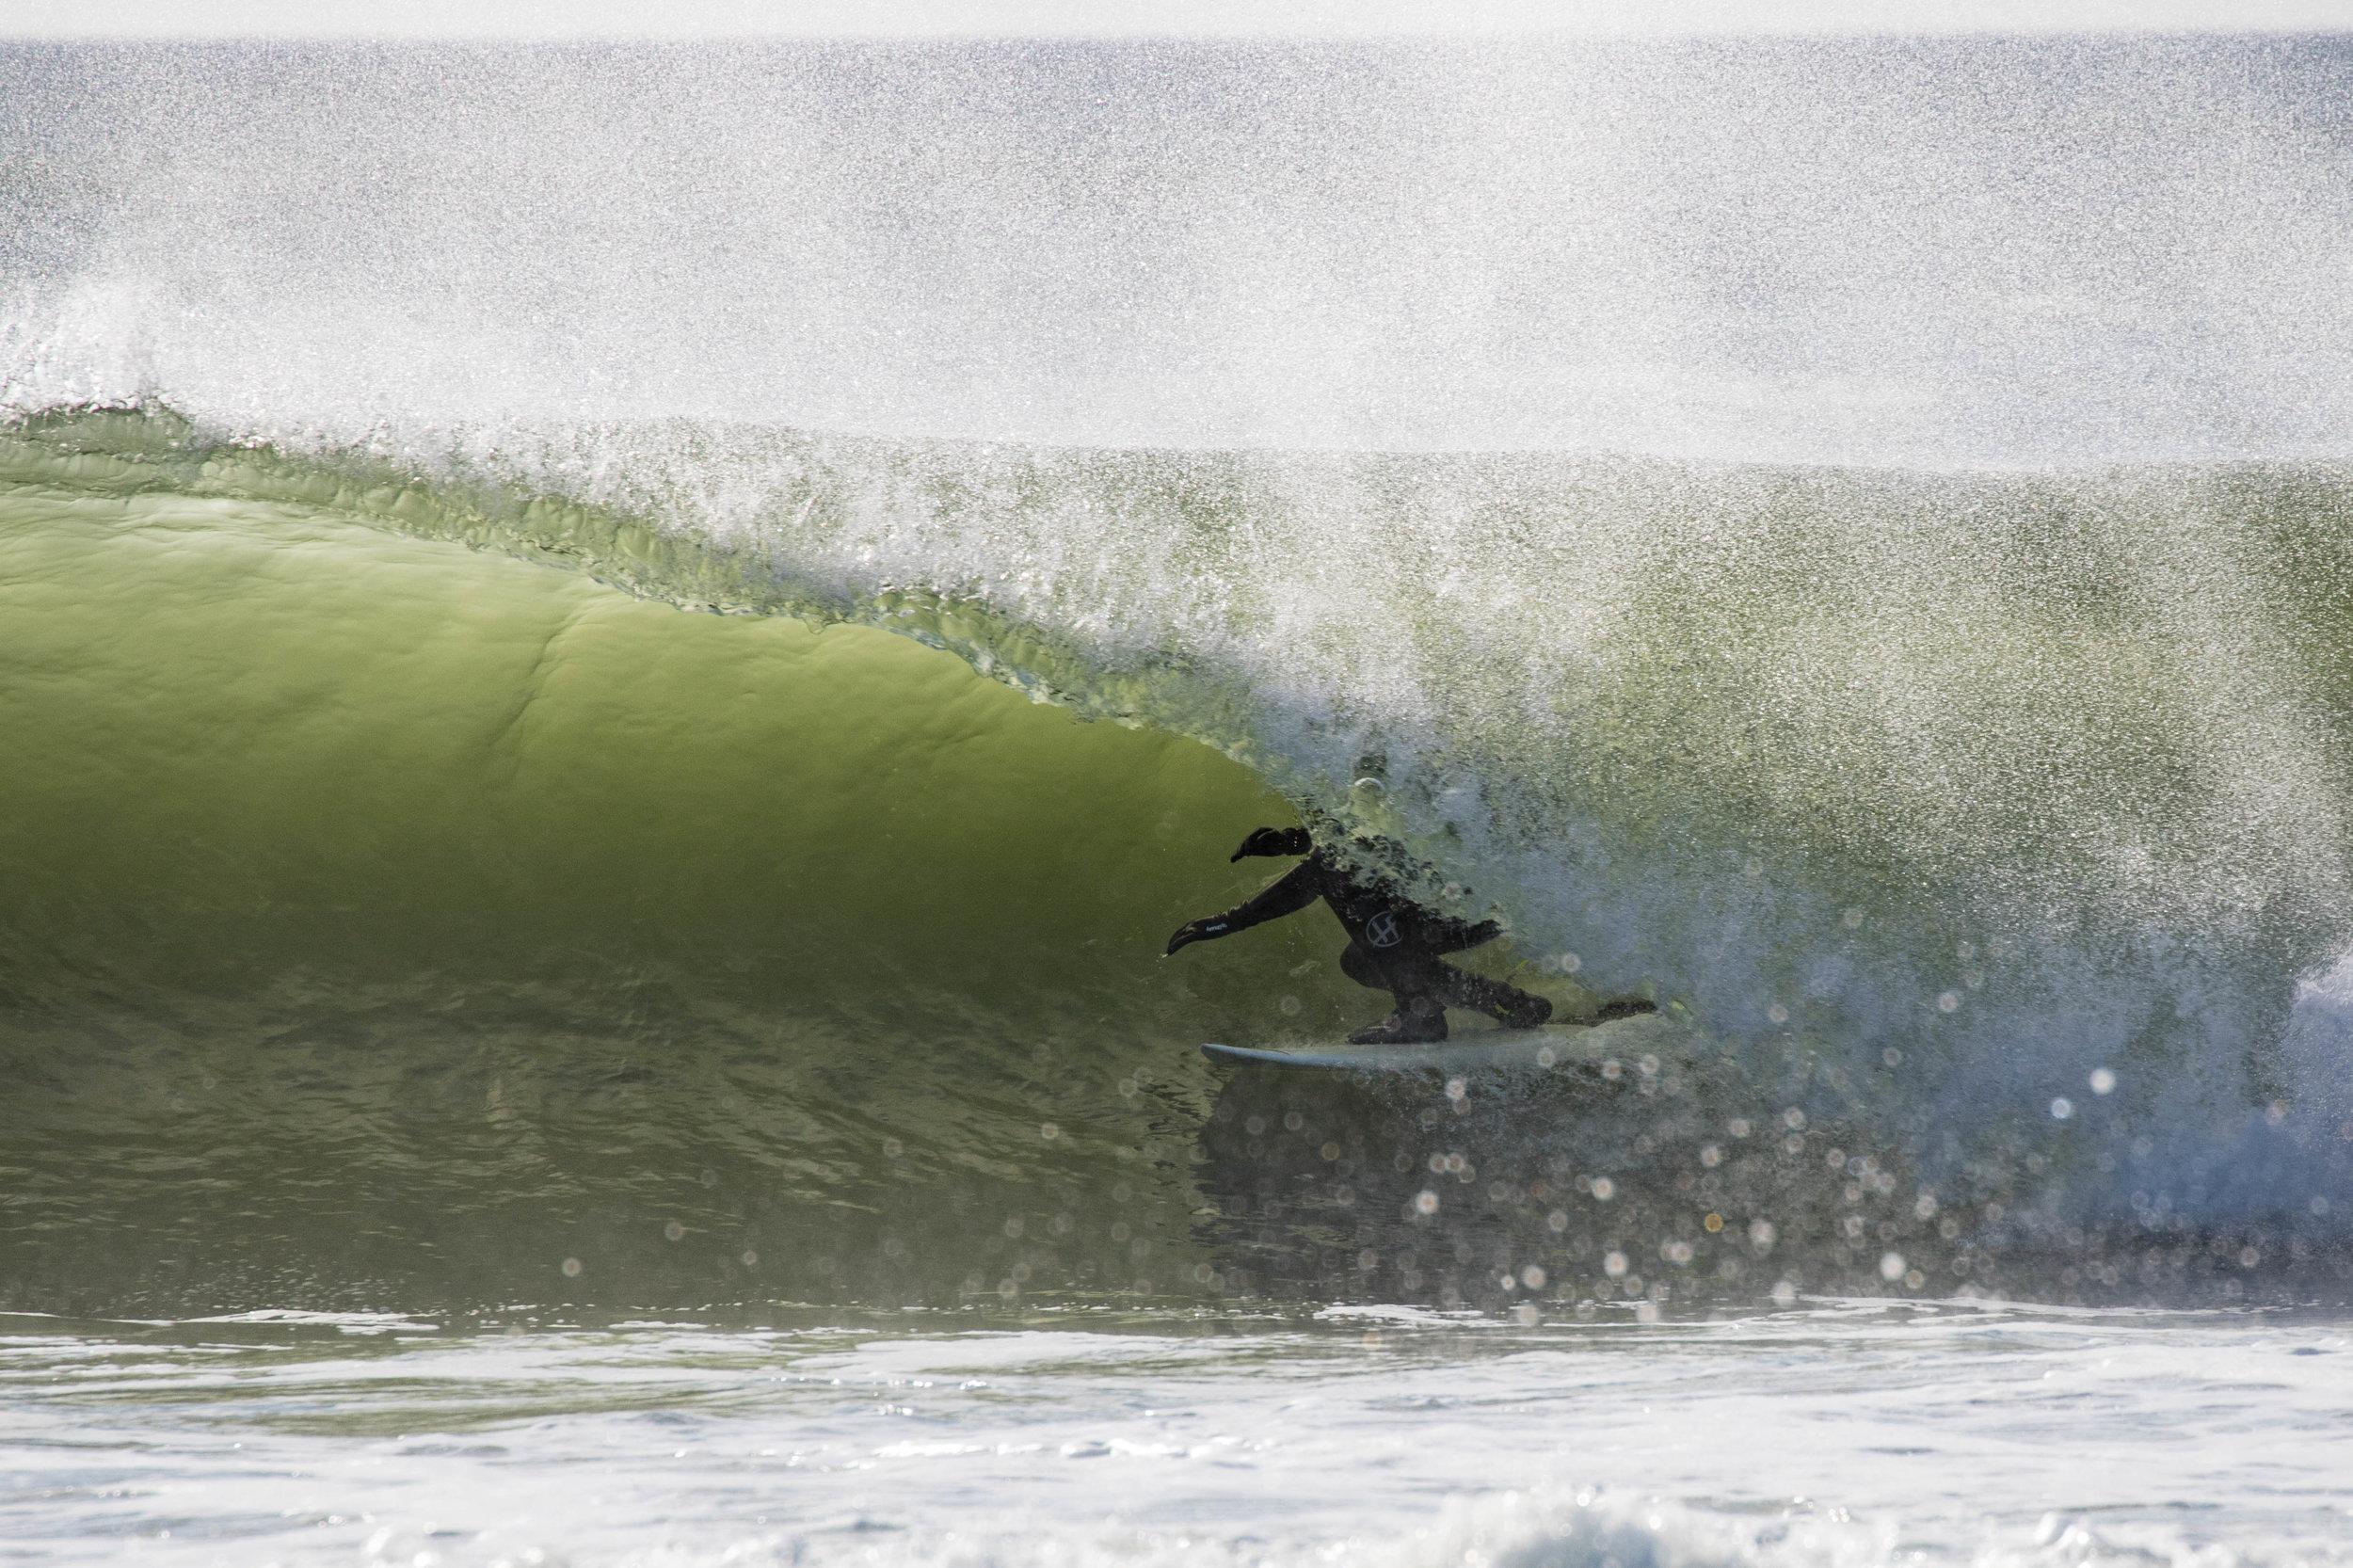 4-26-18 Mantoloking Wave 30.jpg